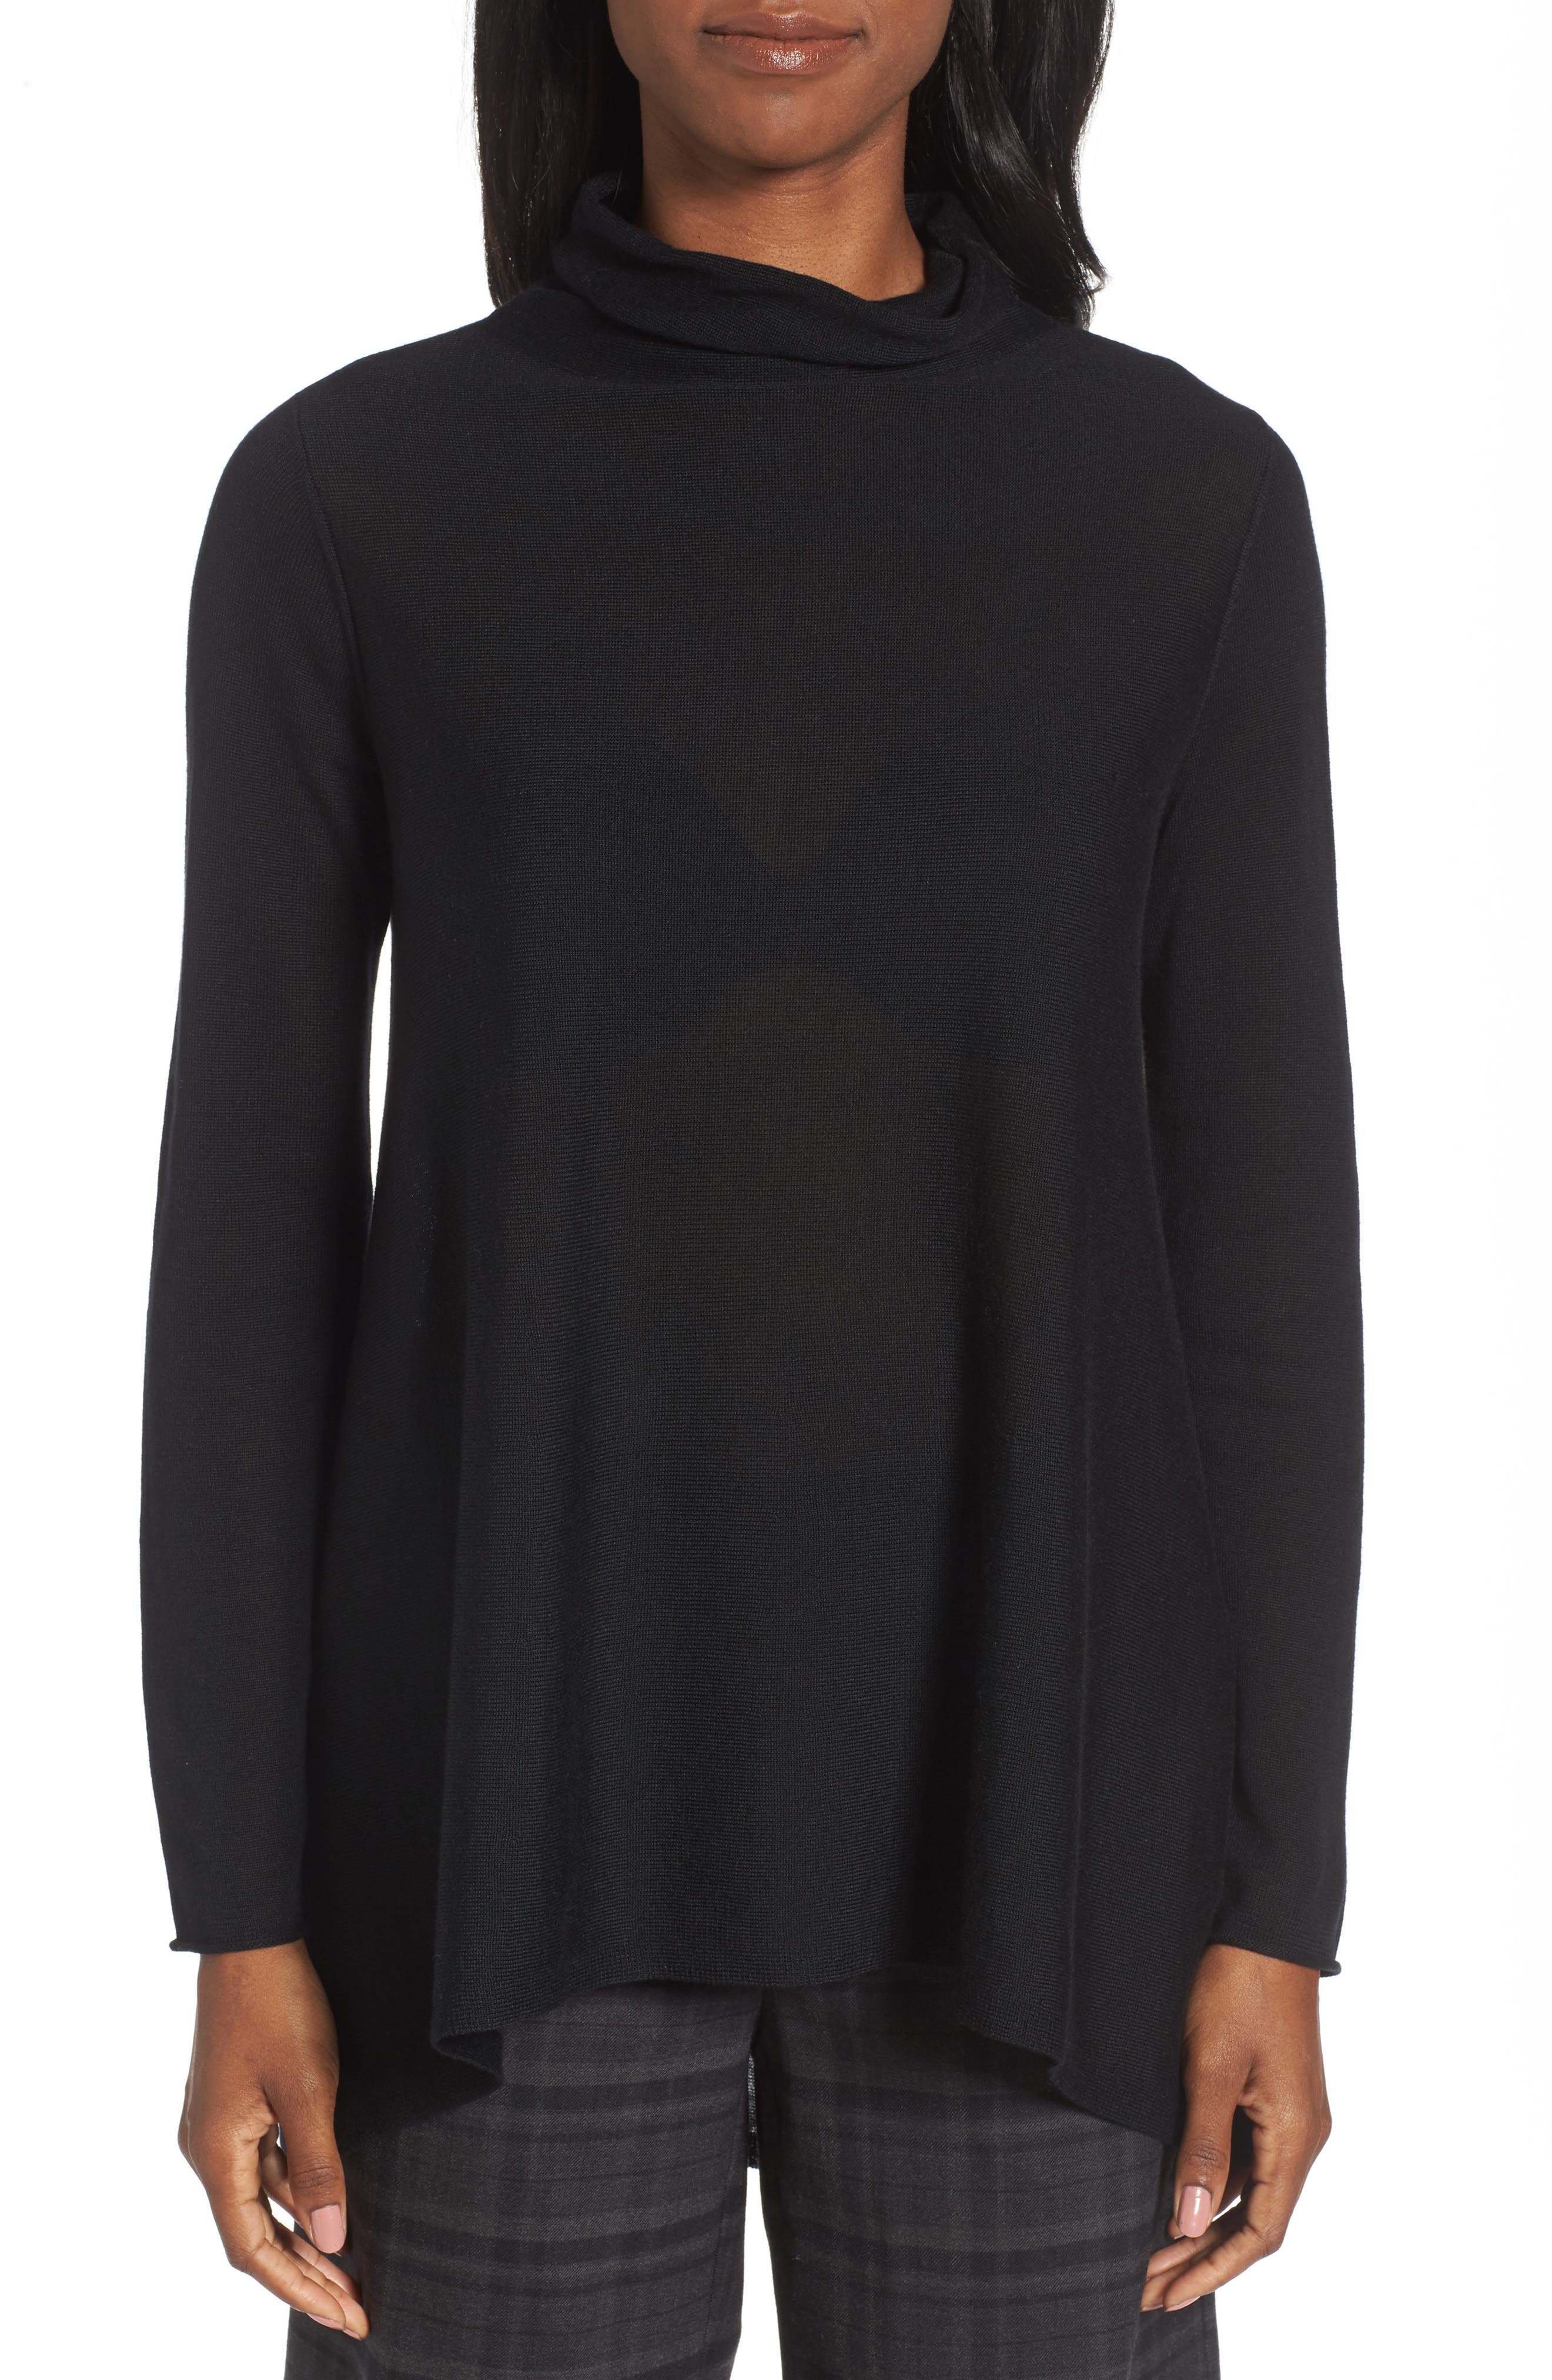 Eileen Fisher Scrunch Turtleneck Sweater